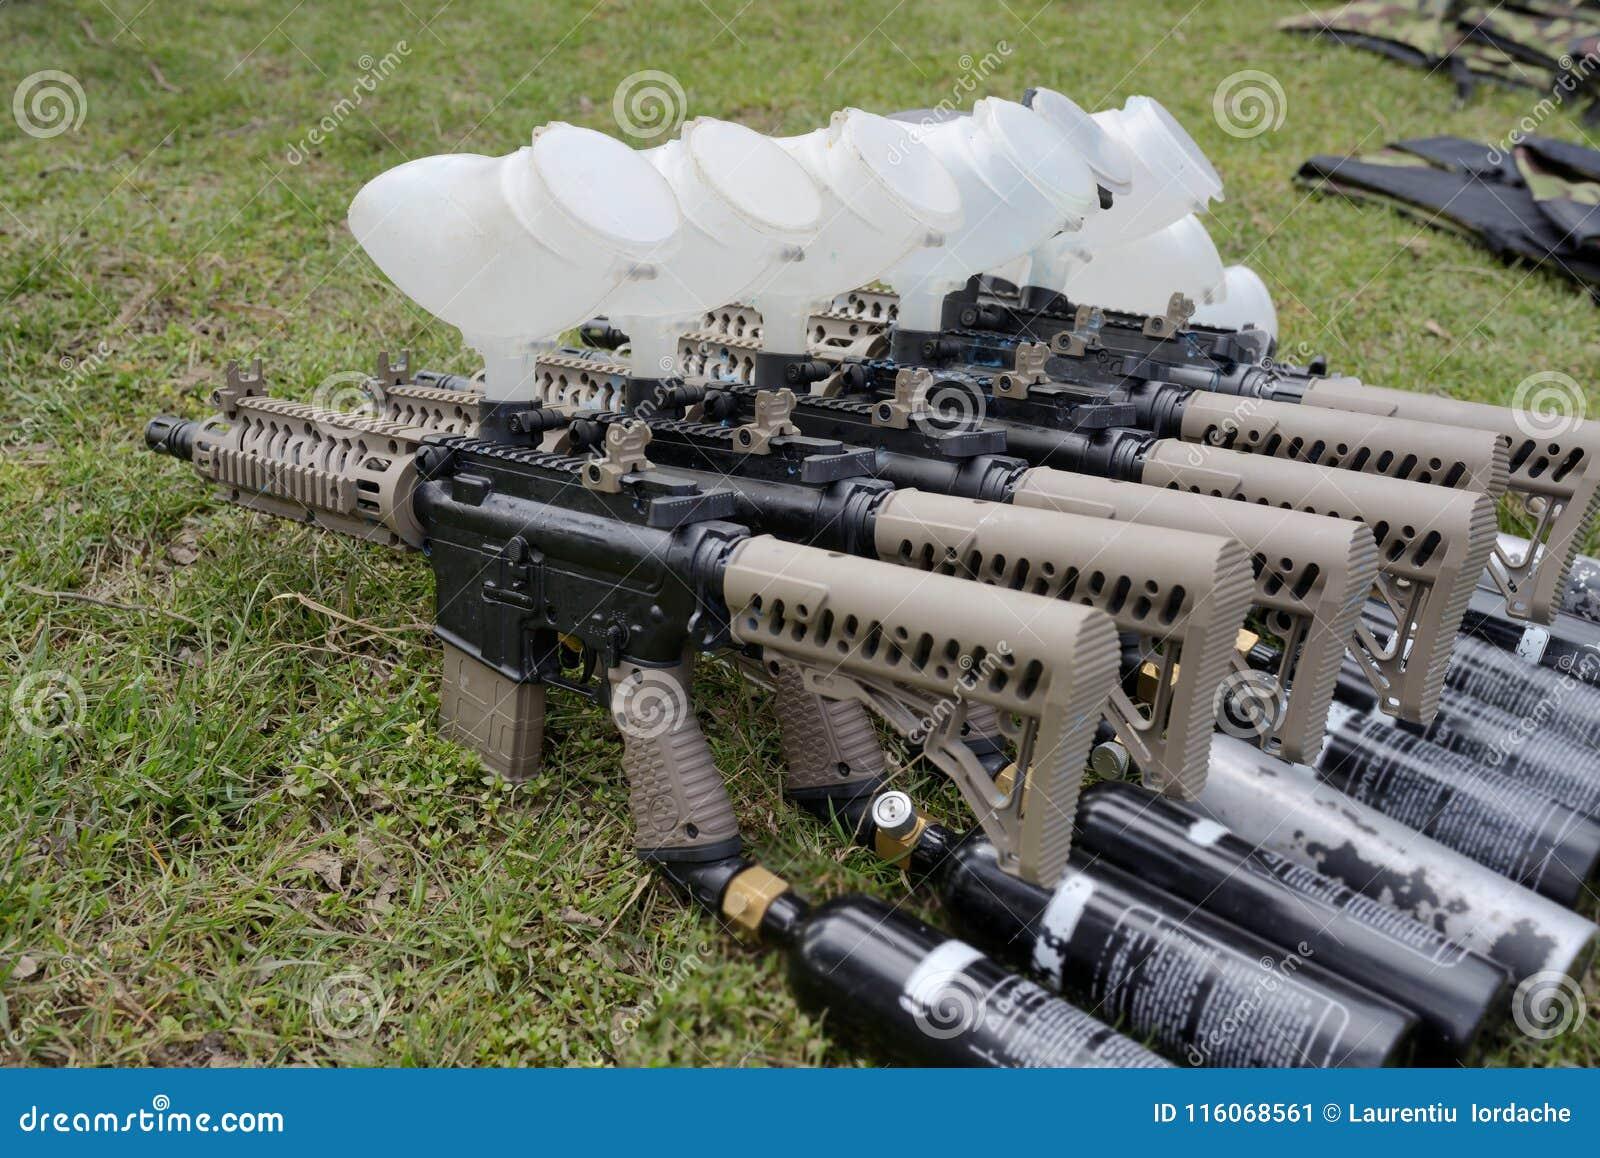 Paintball Guns On Battlefield Stock Image Image Of Ammunition